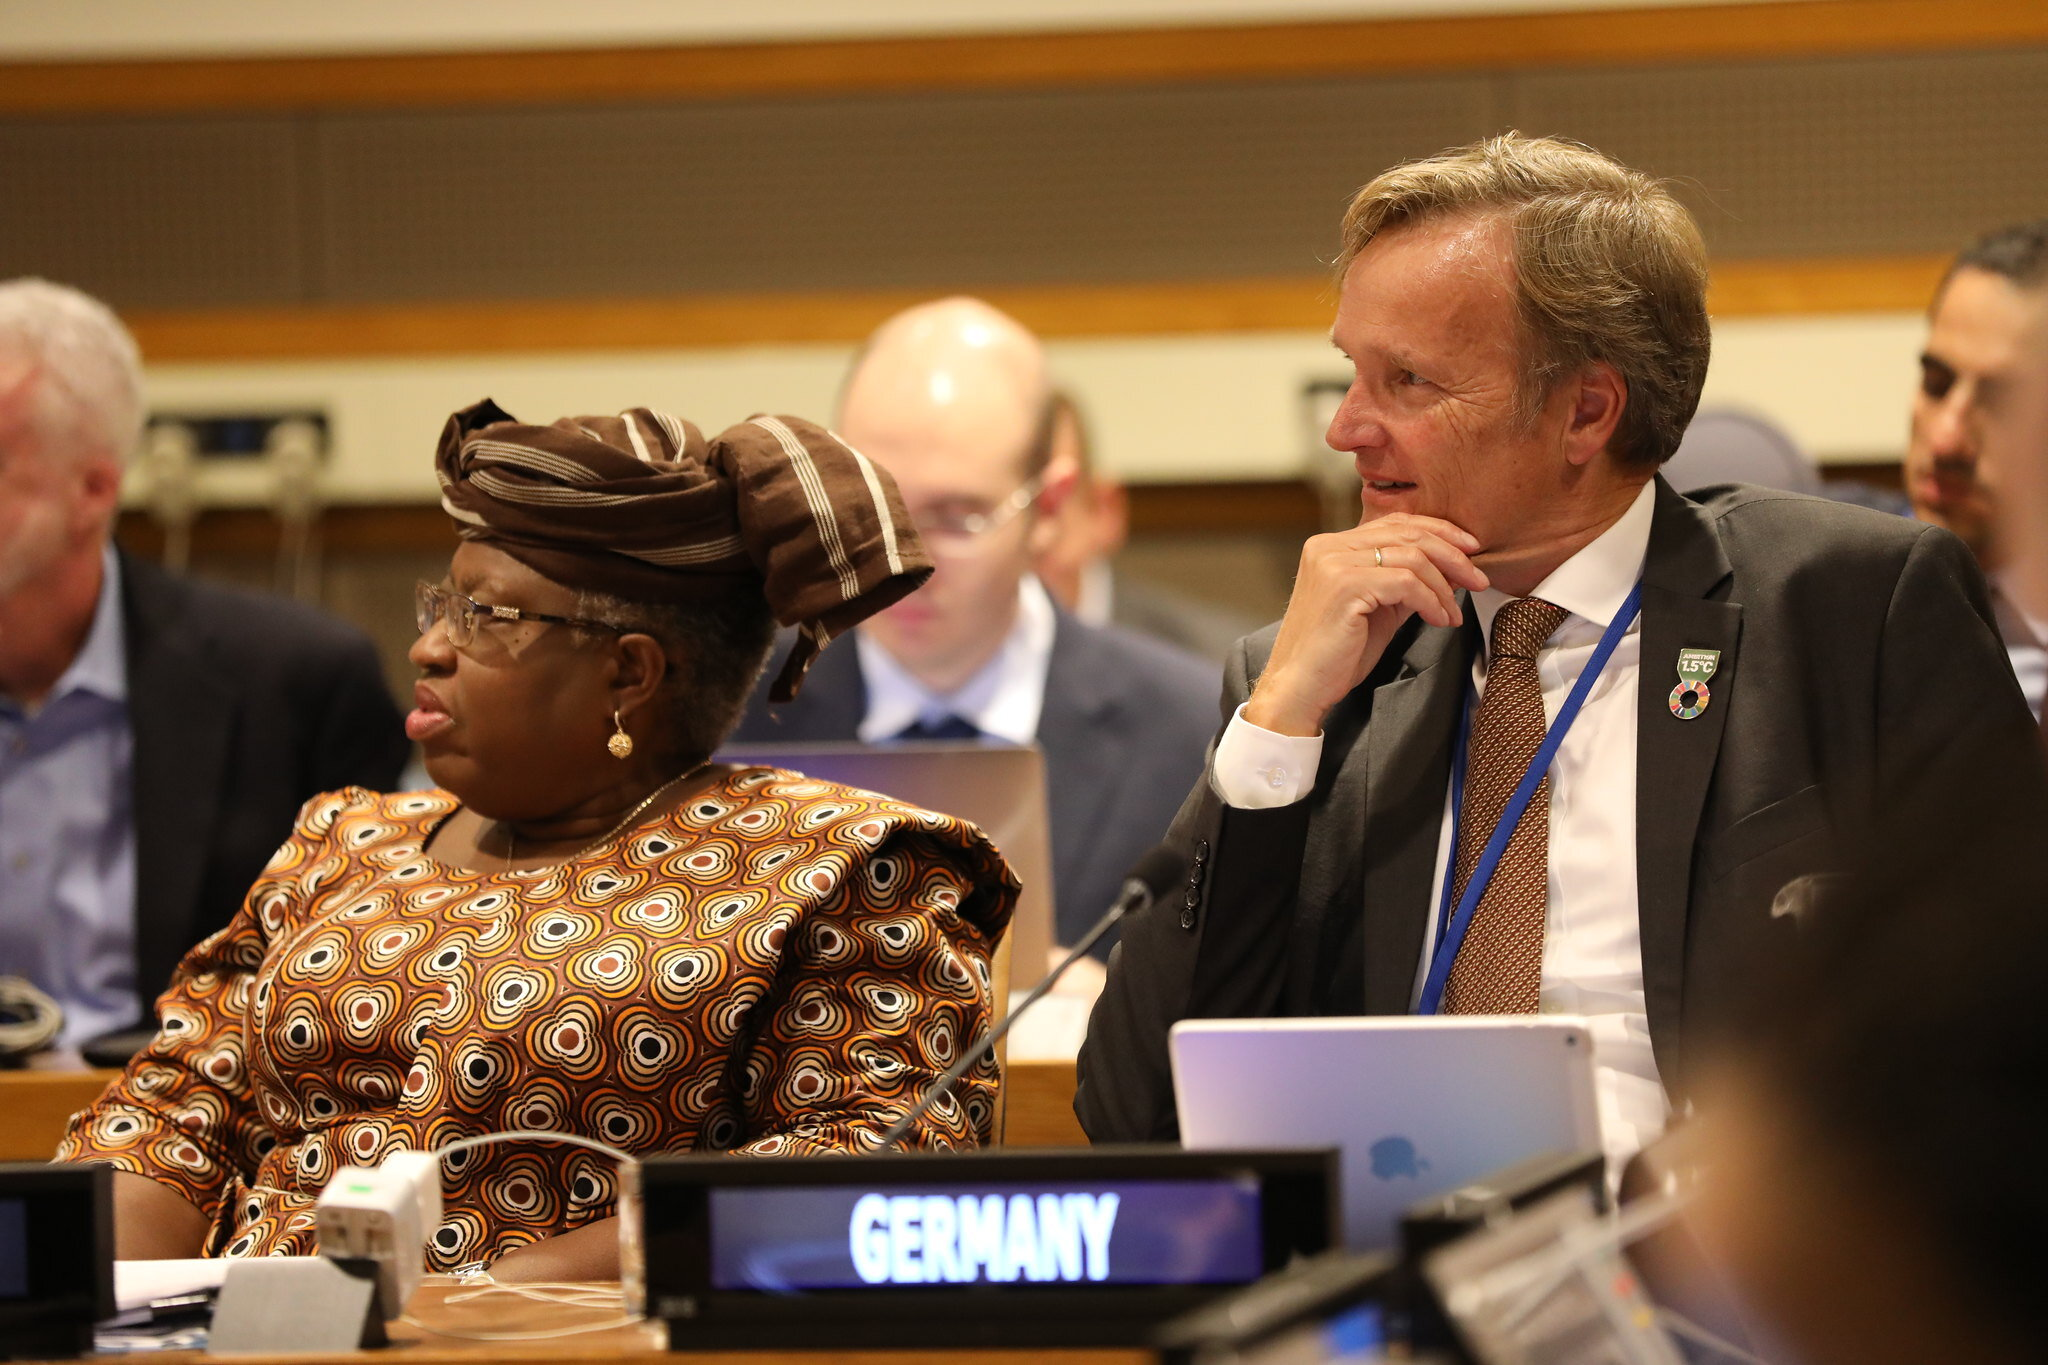 Dr. Ngozi Okonjo-Iweala and Mr Karsten Sach